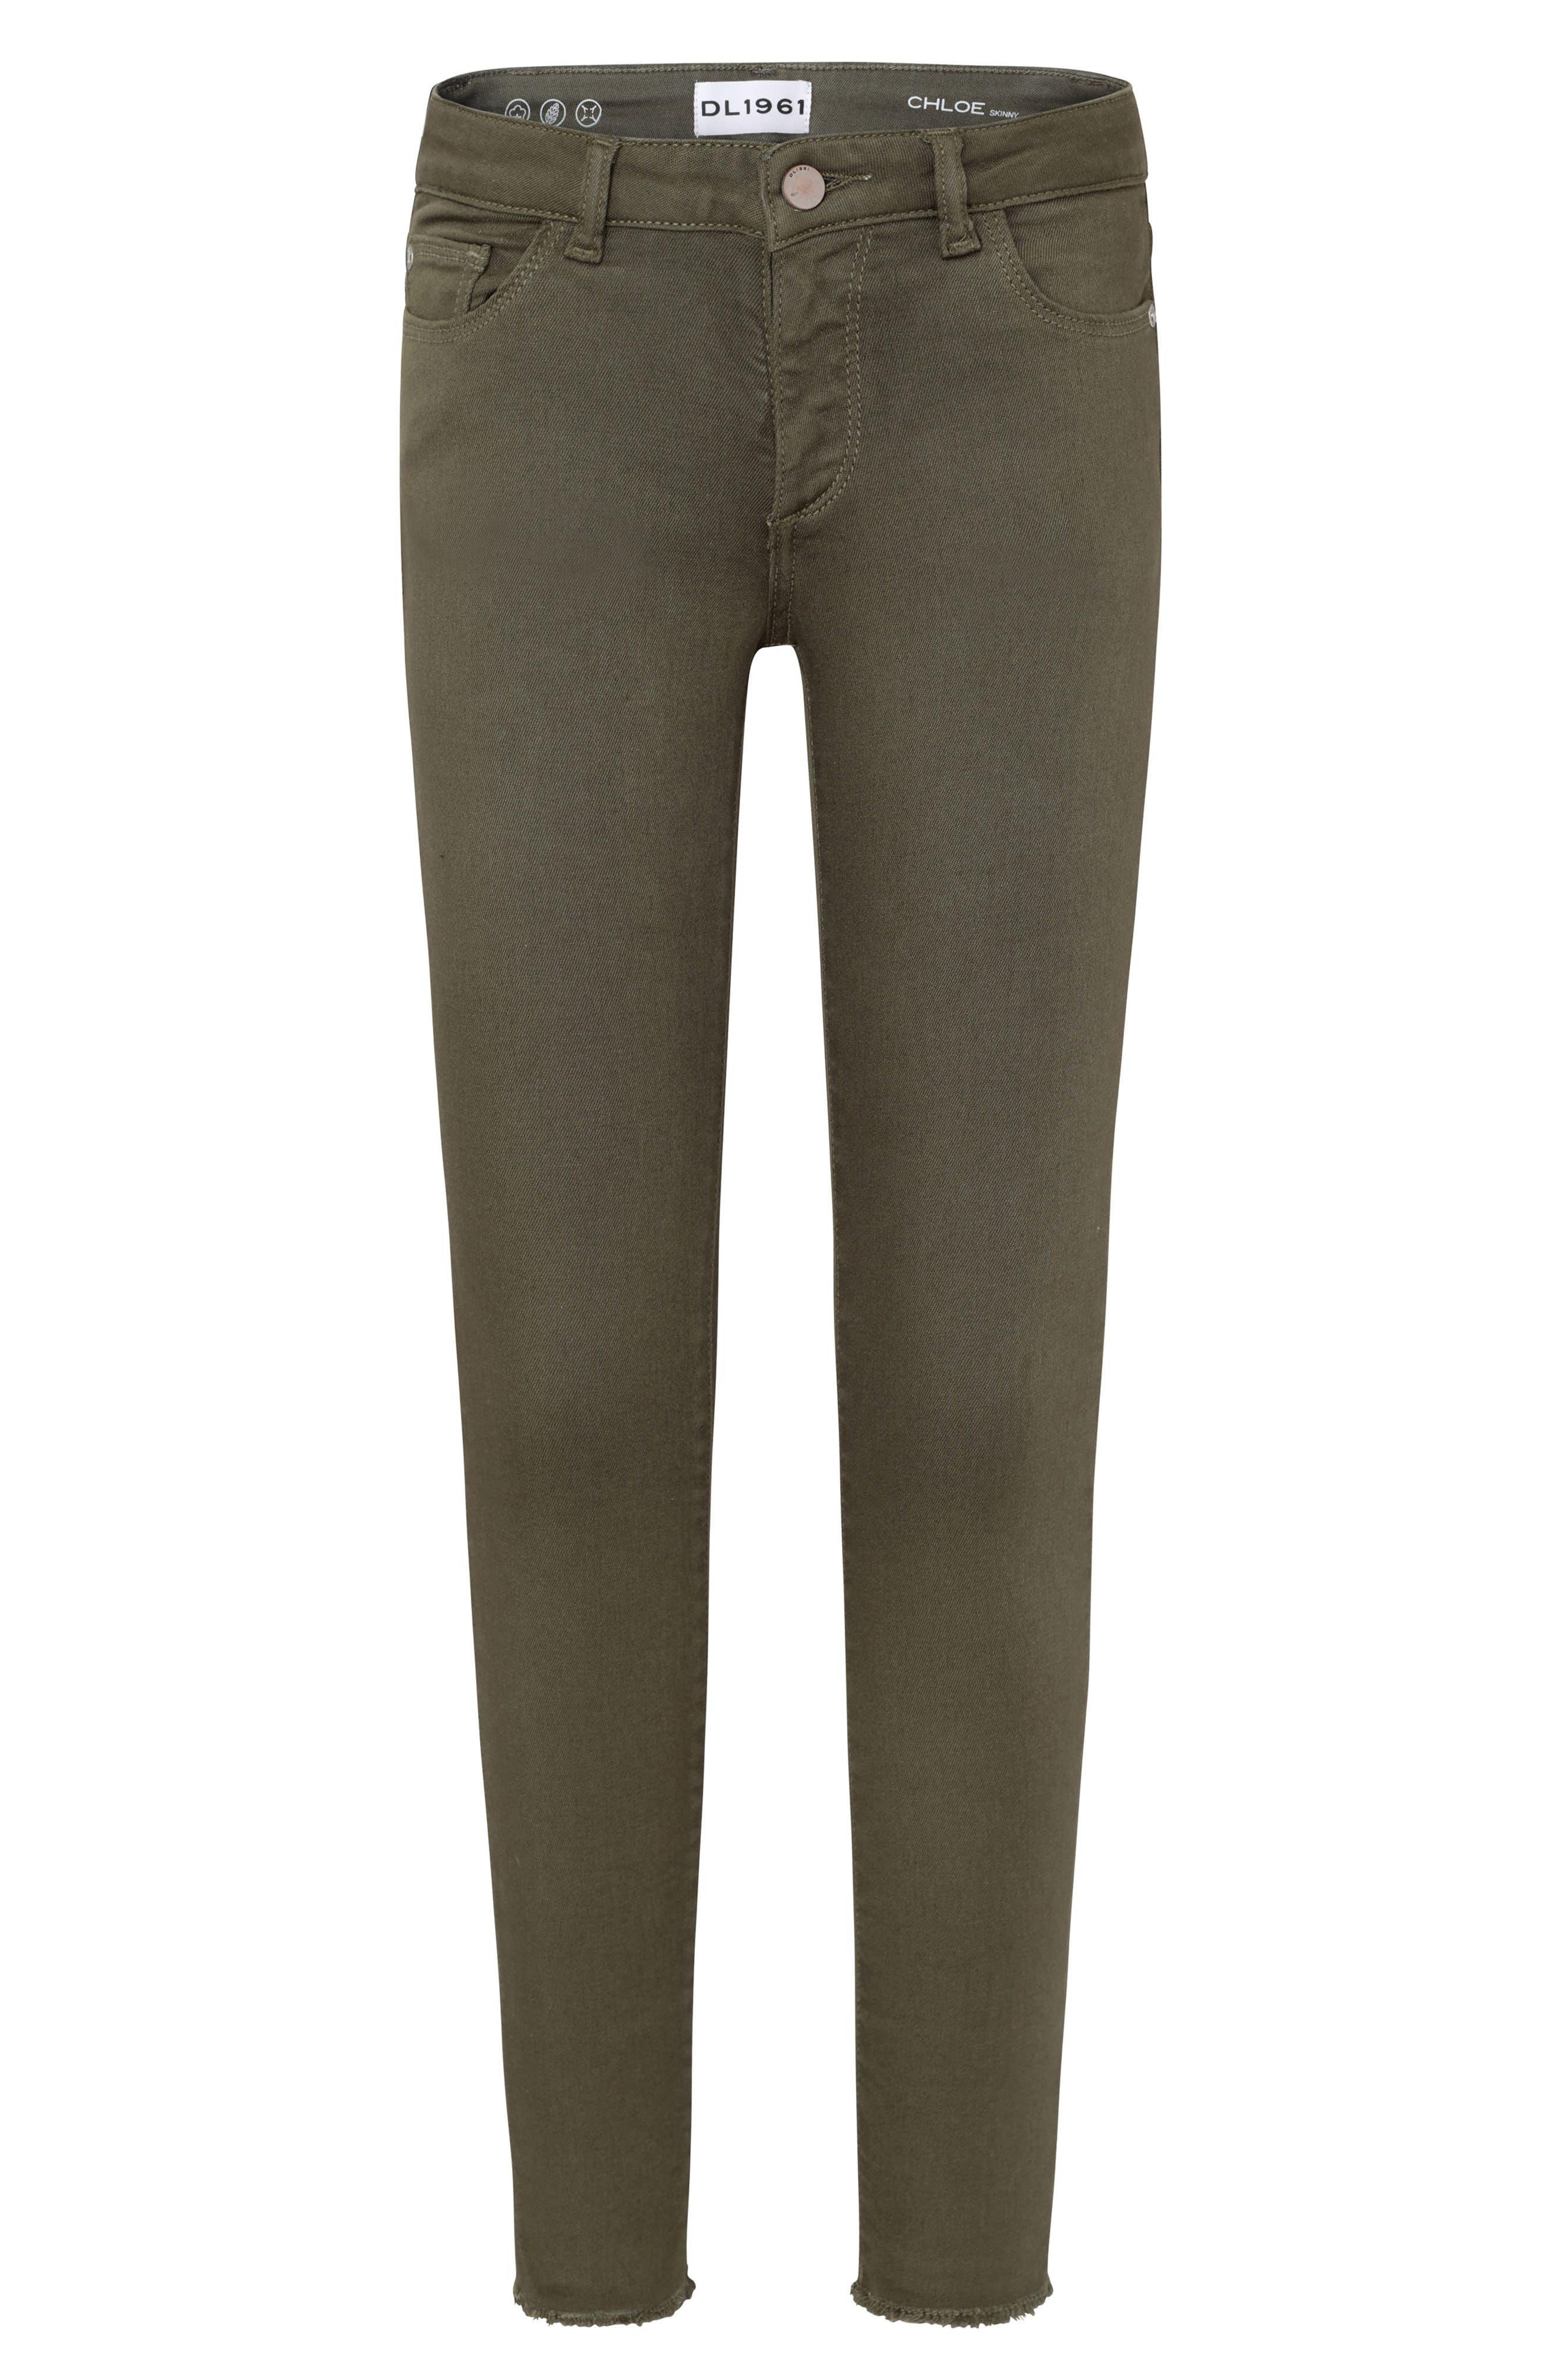 Raw Hem Skinny Jeans,                             Main thumbnail 1, color,                             CAMO GREEN